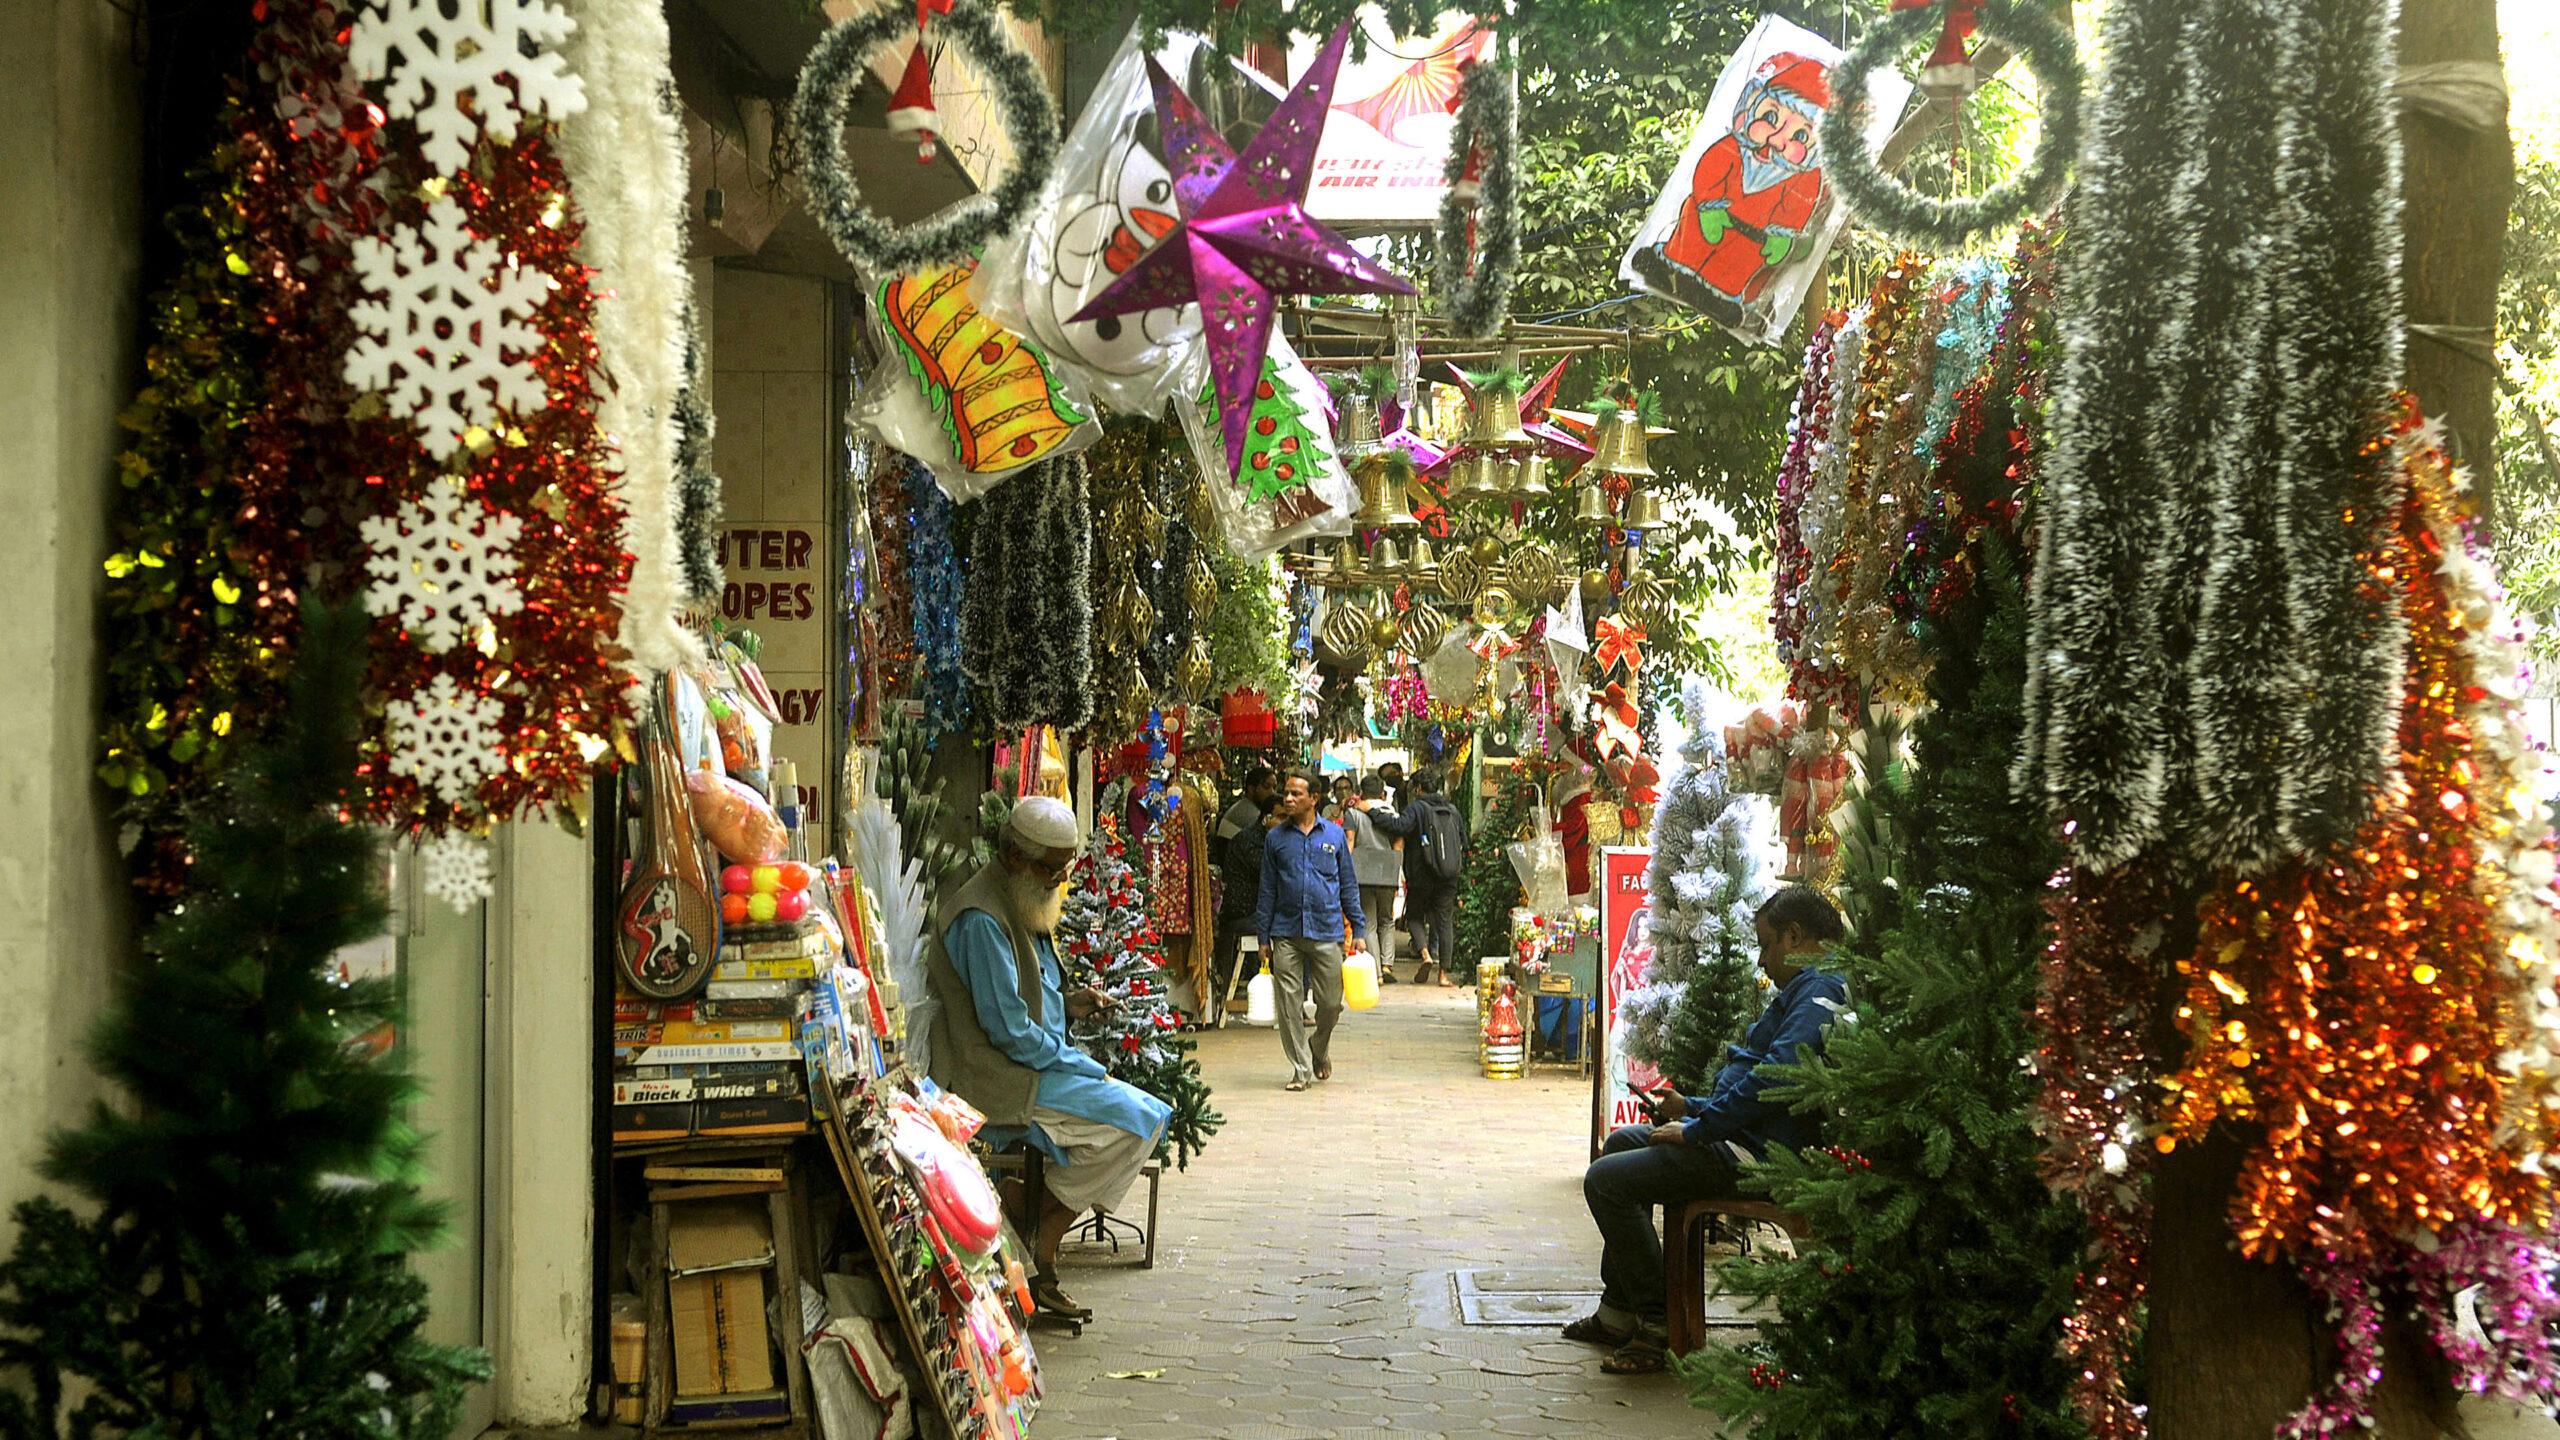 Flaming pudding and carols — Christmas the Anglo-Indian way